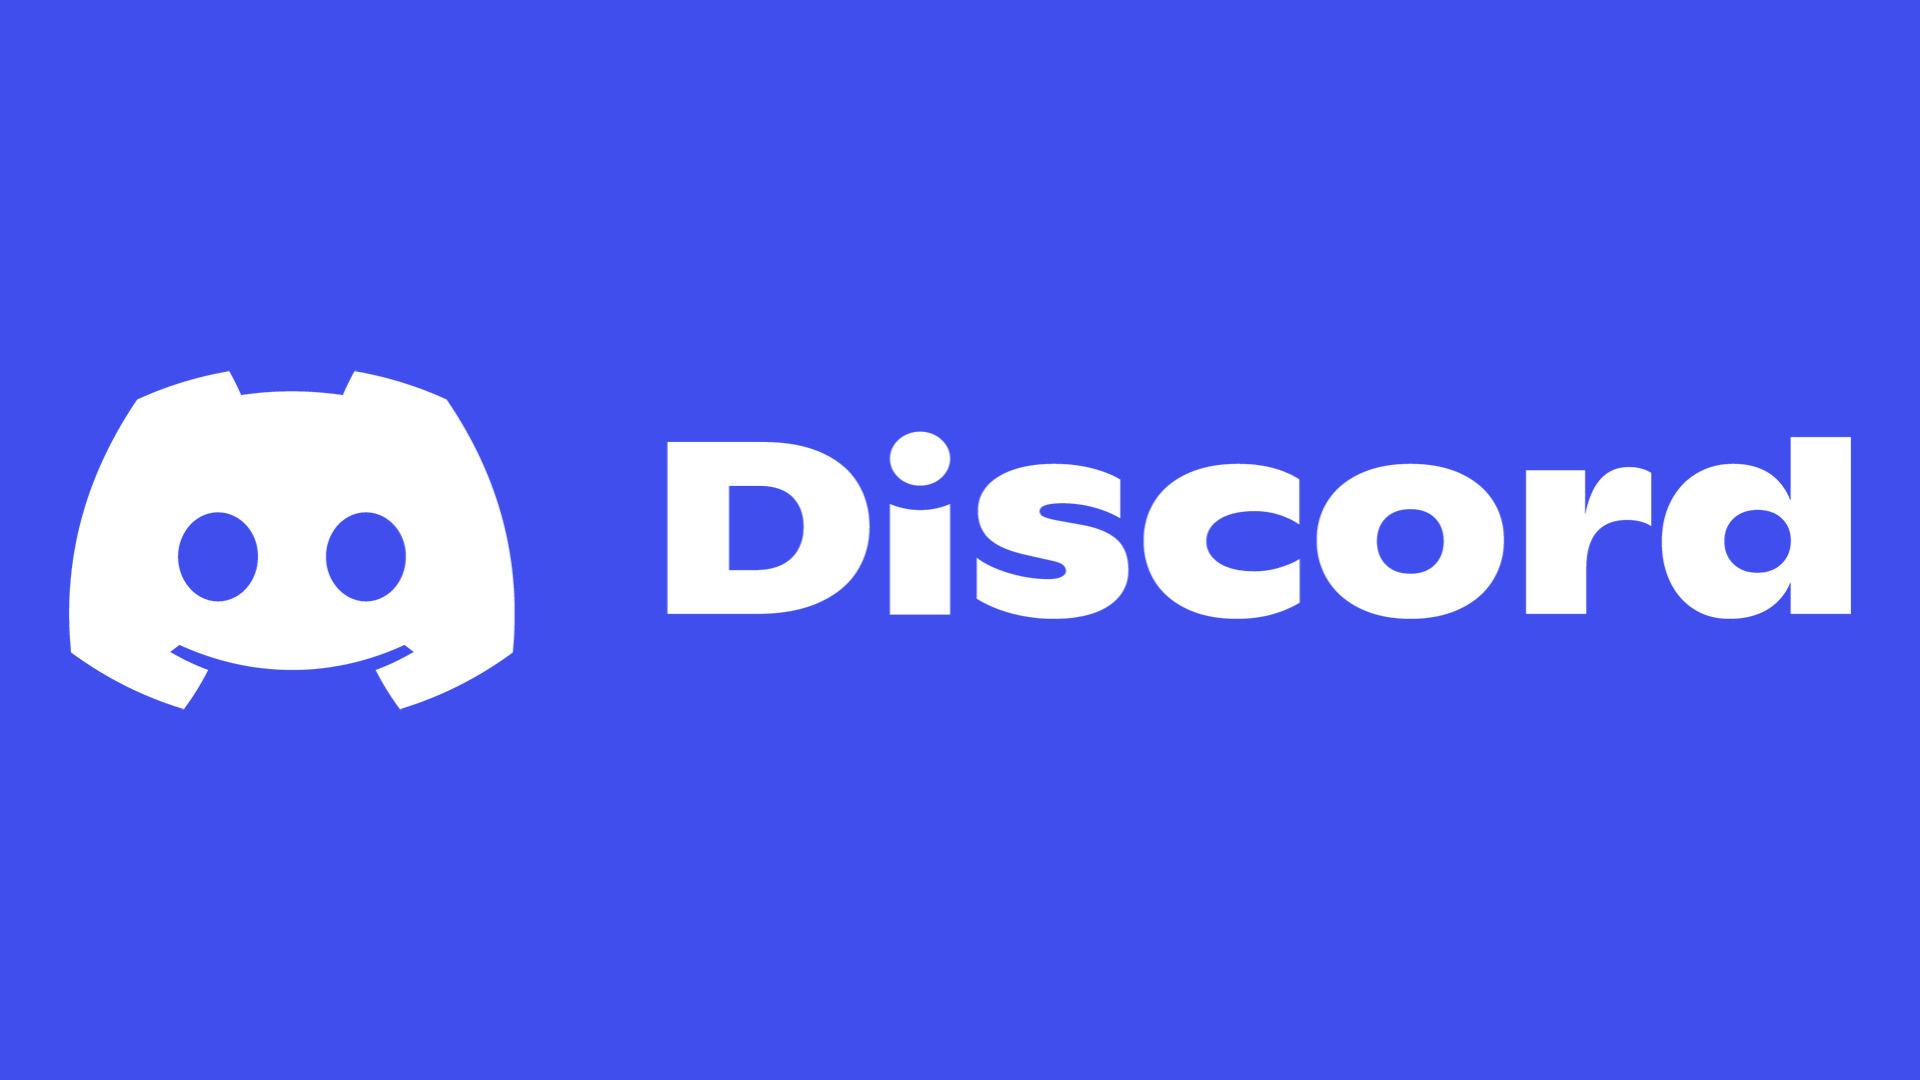 Logo, Redesign, Farben, icon, Discord, Mai 2021